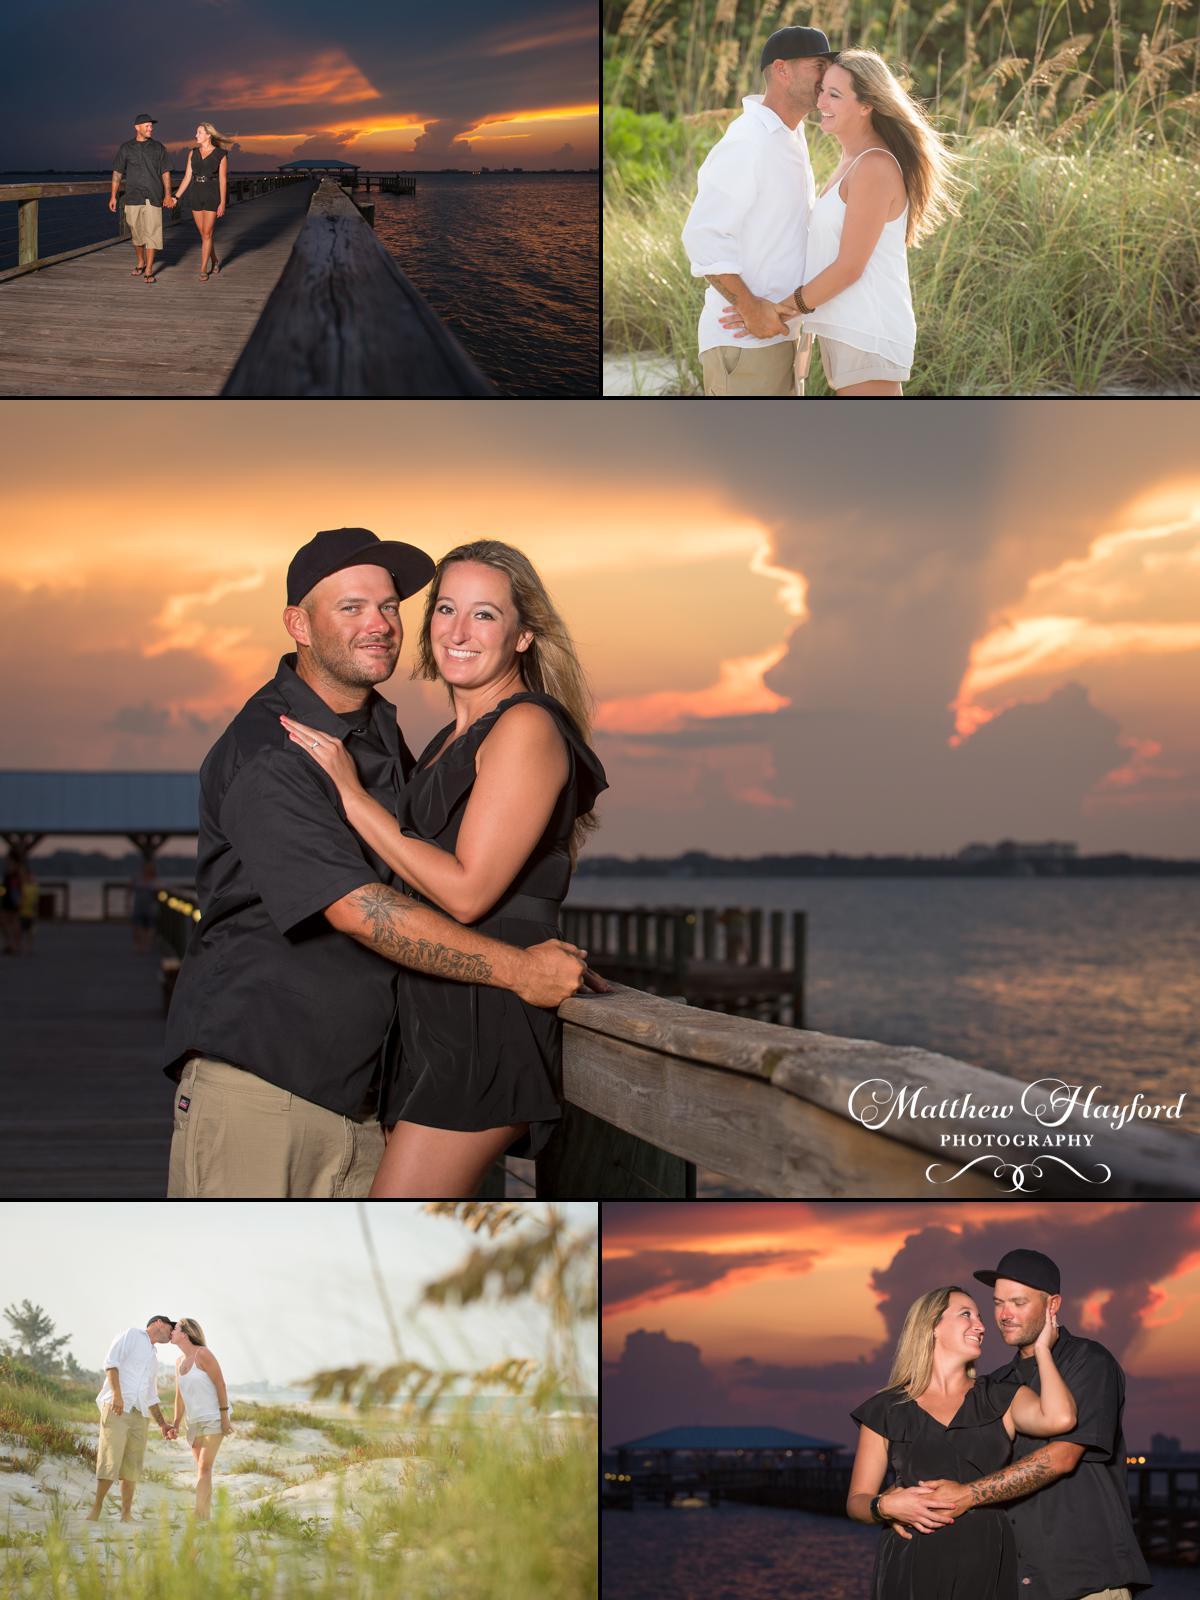 Melbourne Florida Engagement Photos